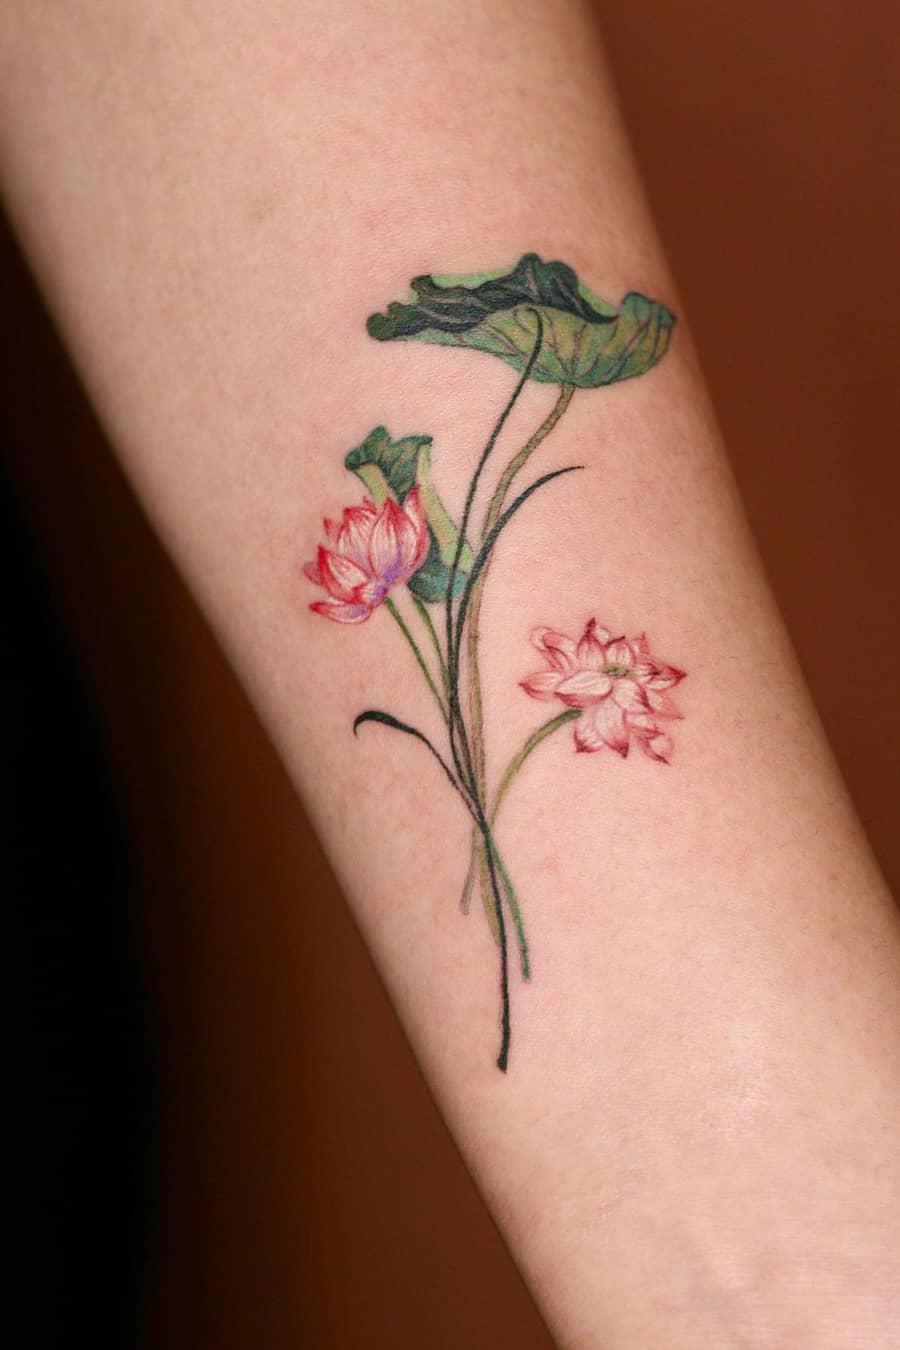 Green lotus tattoo